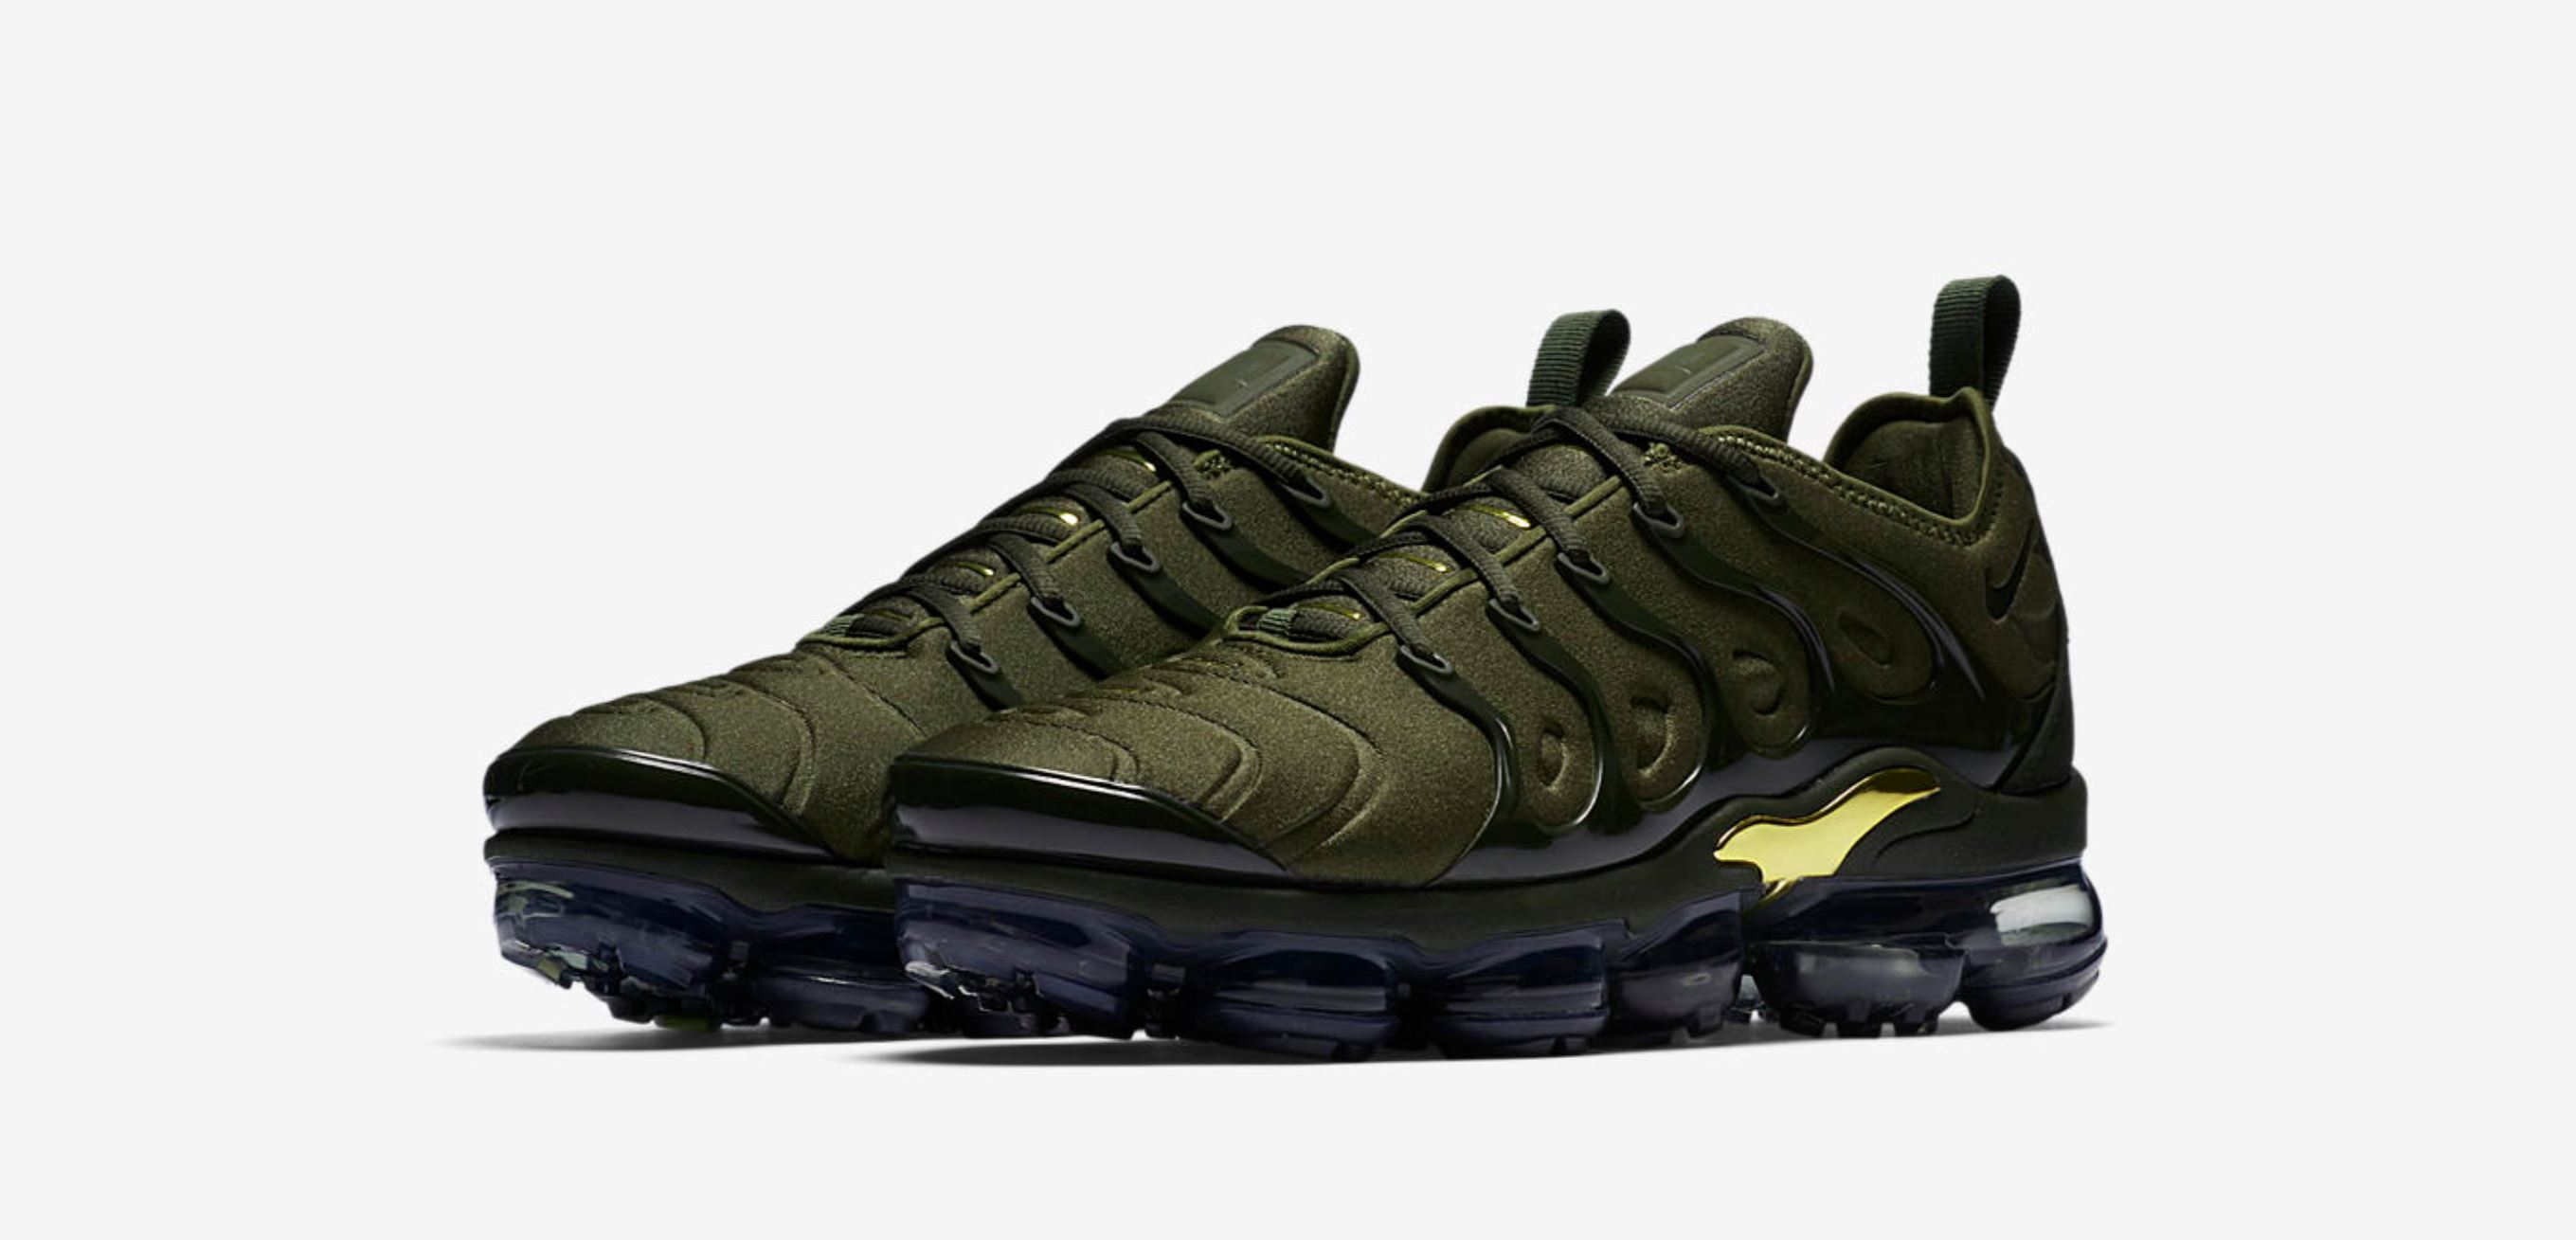 Nike Air VaporMax Plus 'Olive' Drops